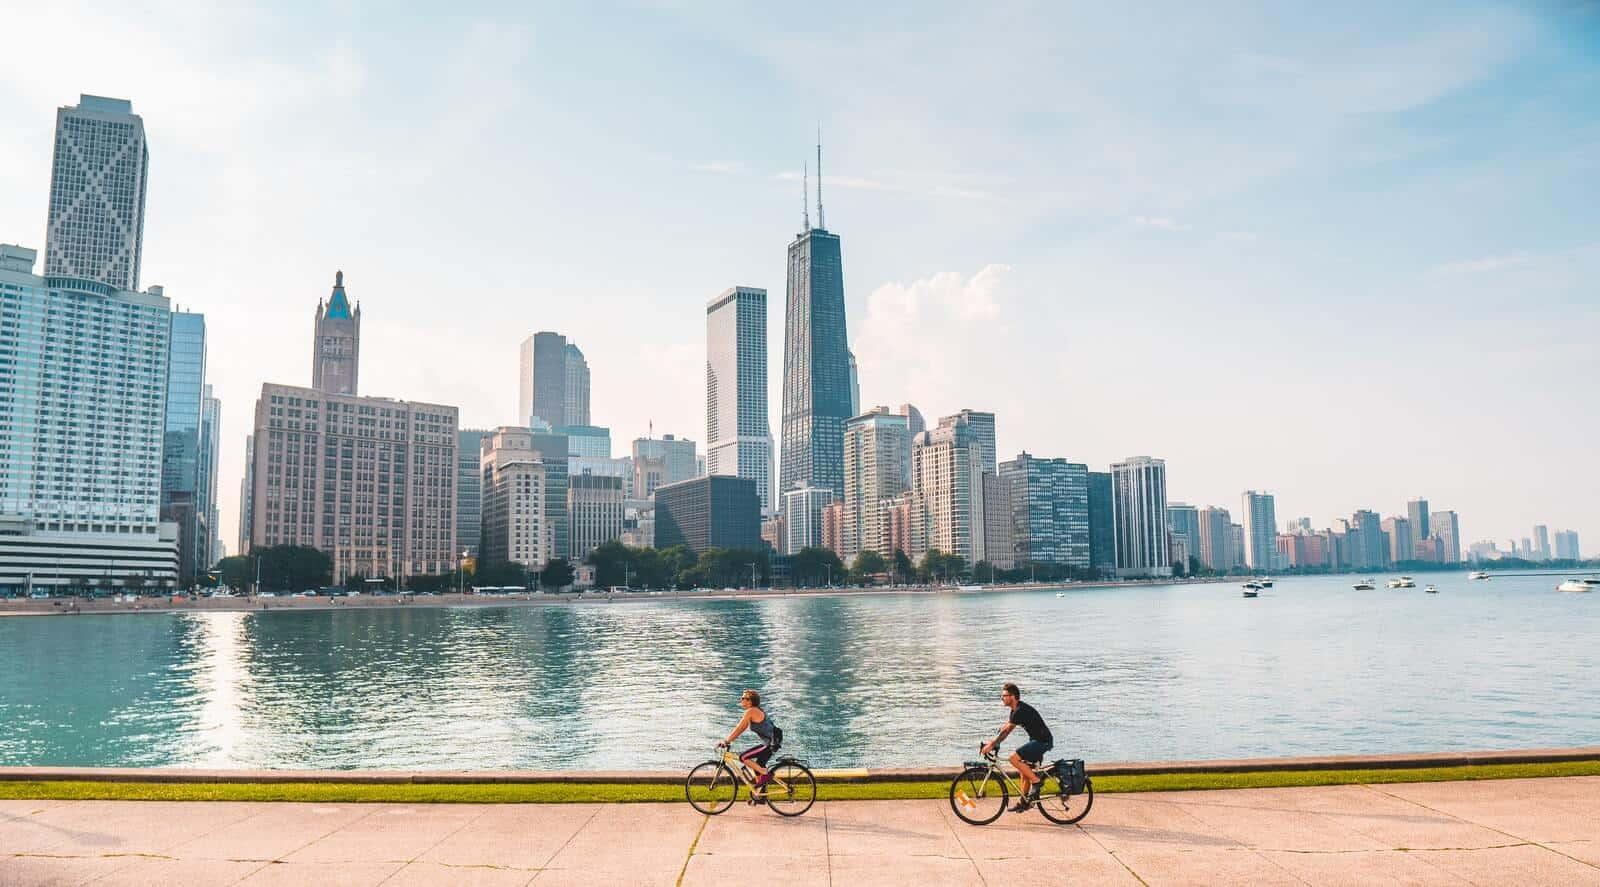 two people ride their bikes through Chicago